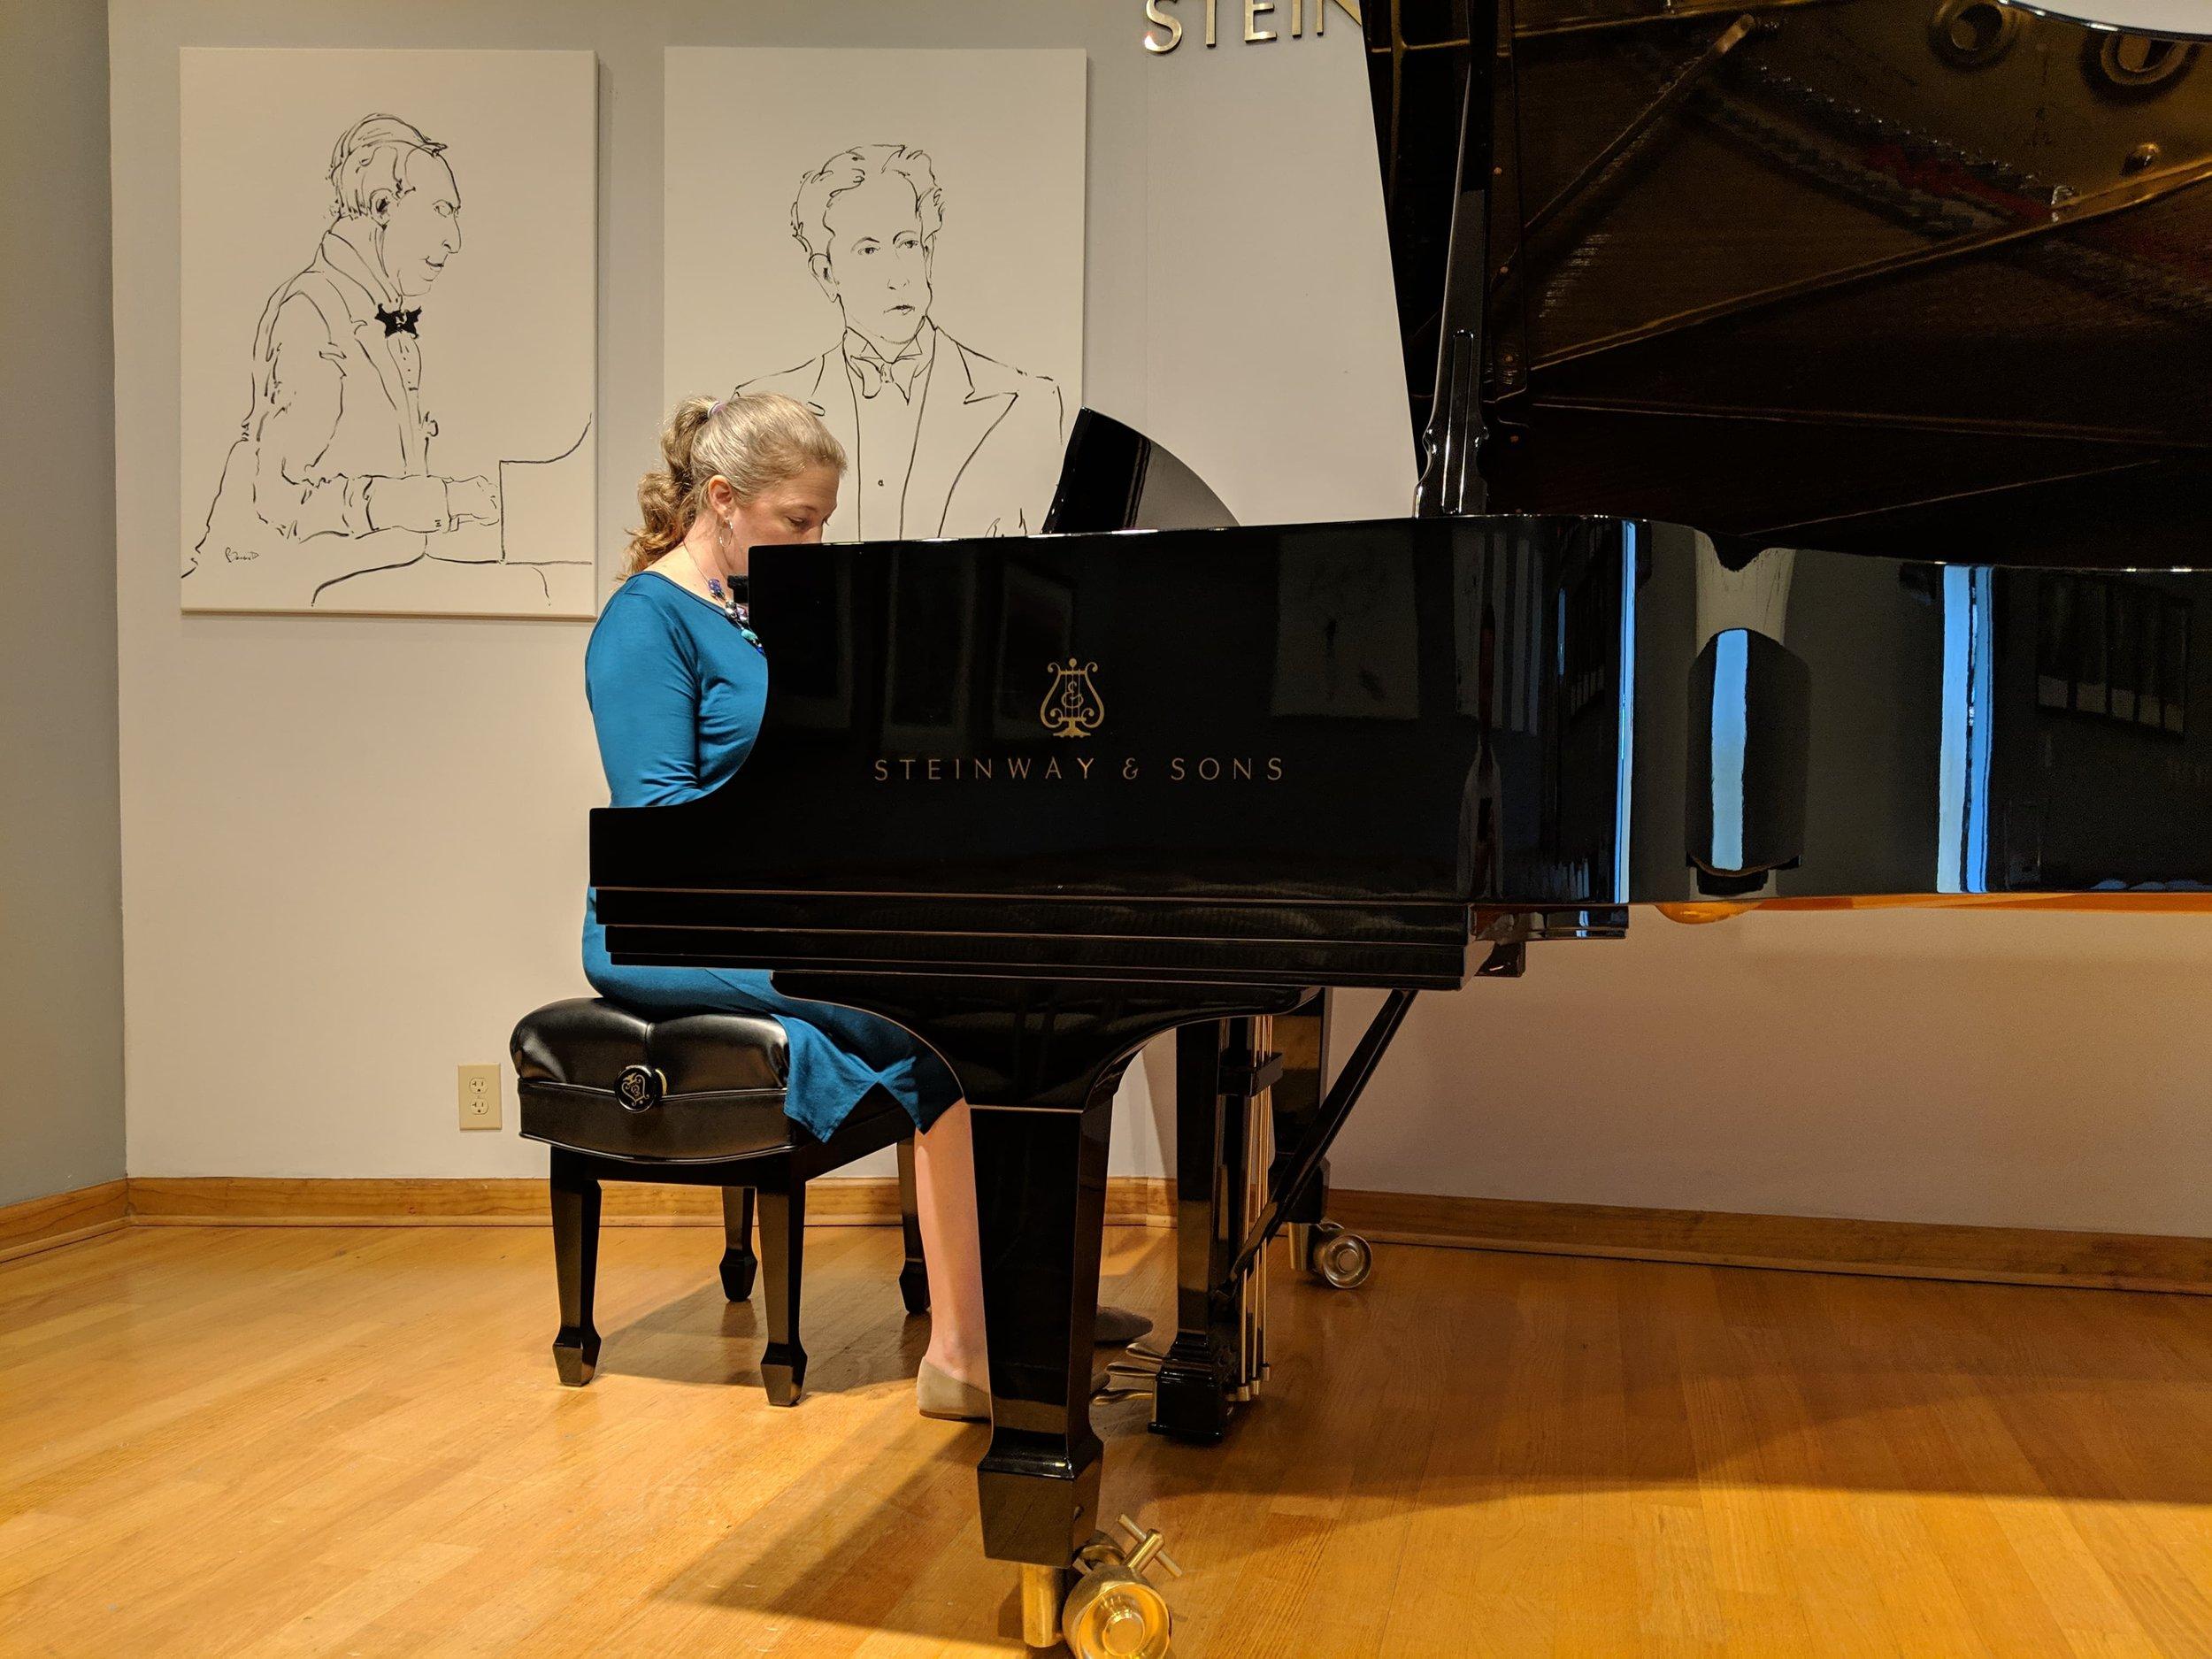 The-Mobile-Music-Studio__Jennifer-playing-piano.jpg